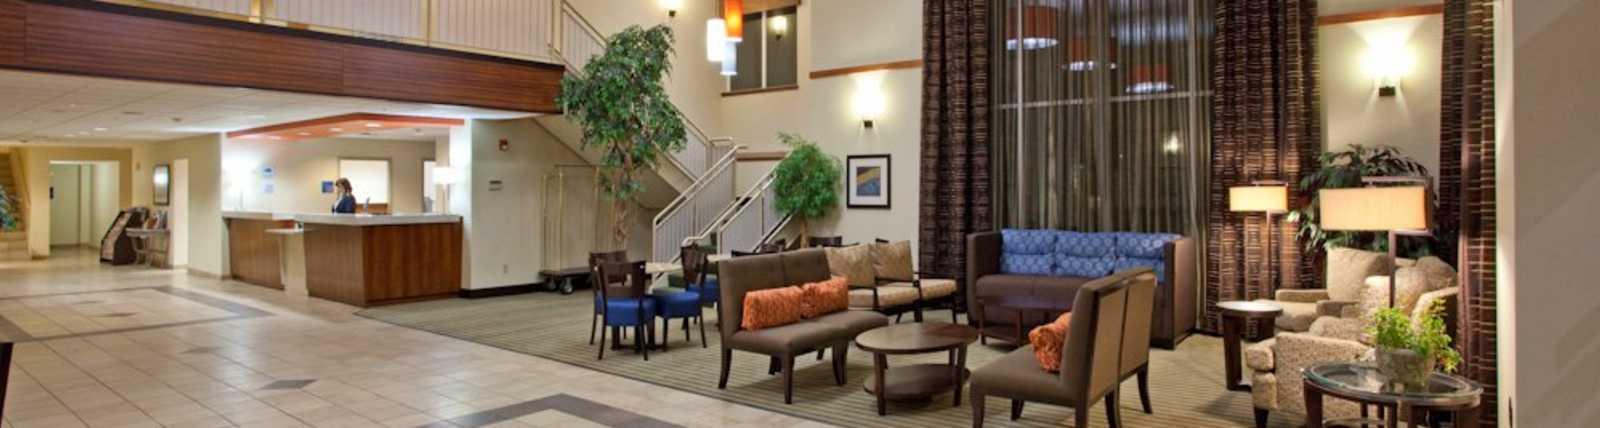 Holiday Inn Express & Suites SeaTac